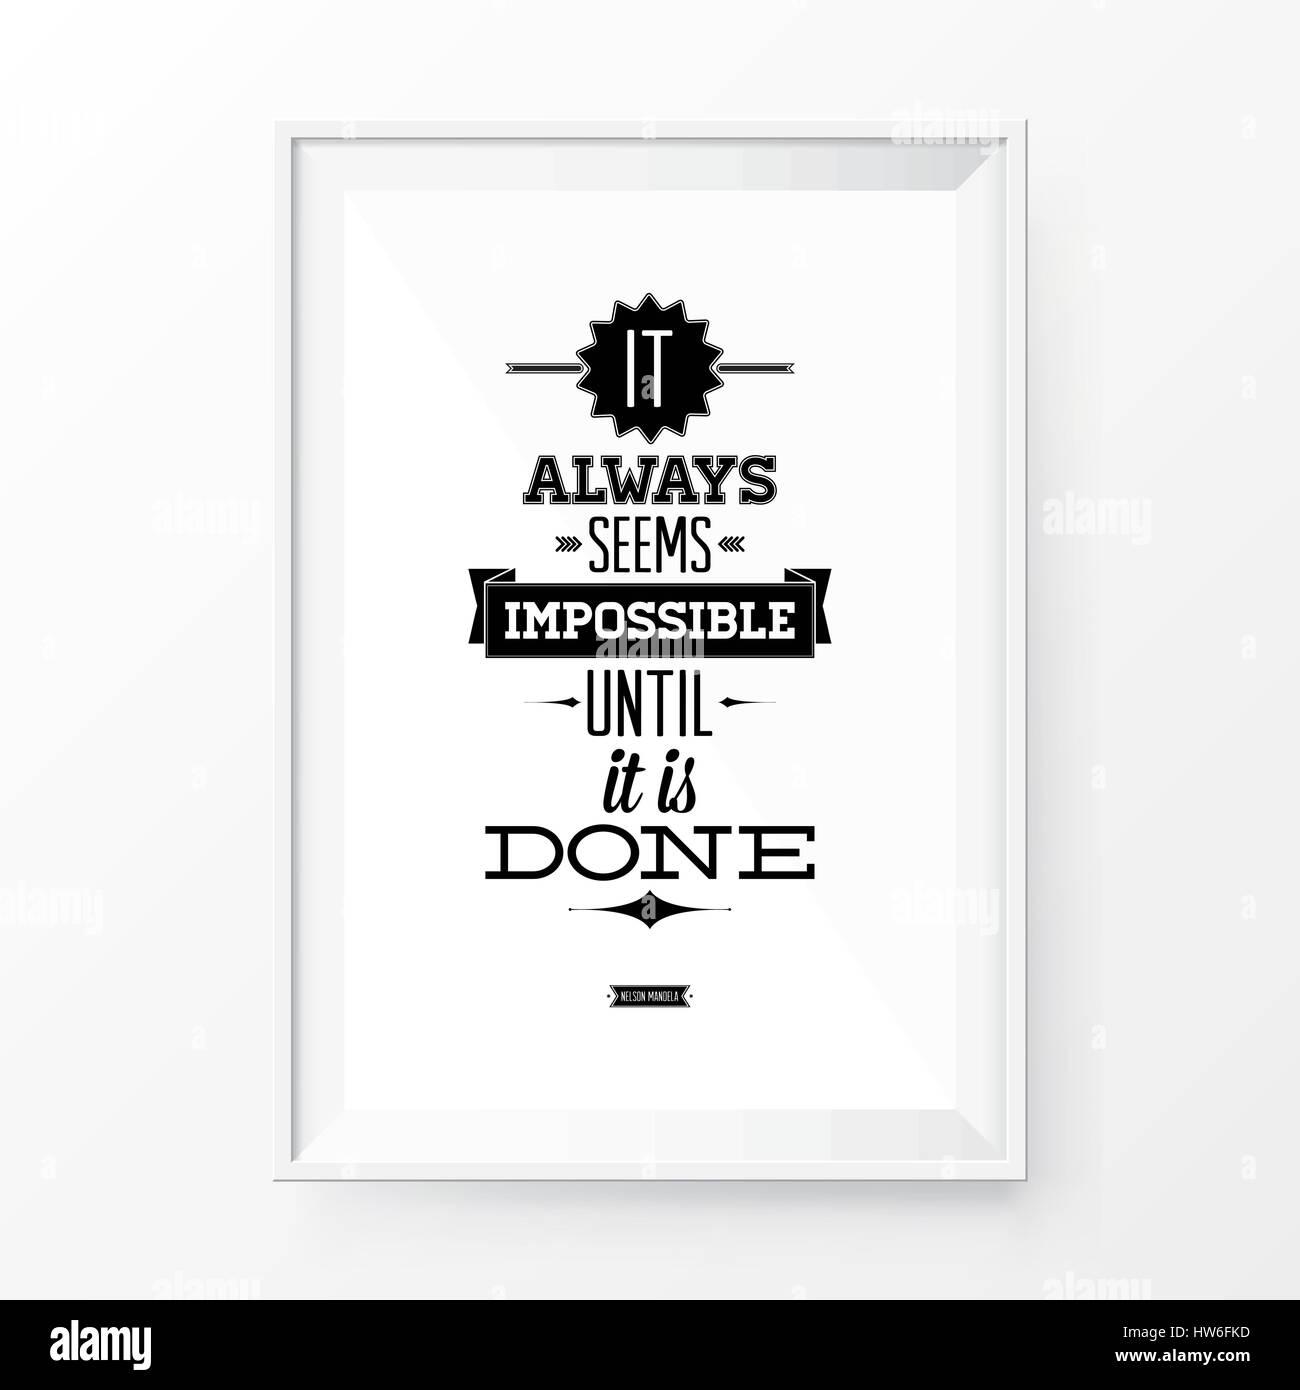 Quote Poster Imágenes De Stock & Quote Poster Fotos De Stock - Alamy